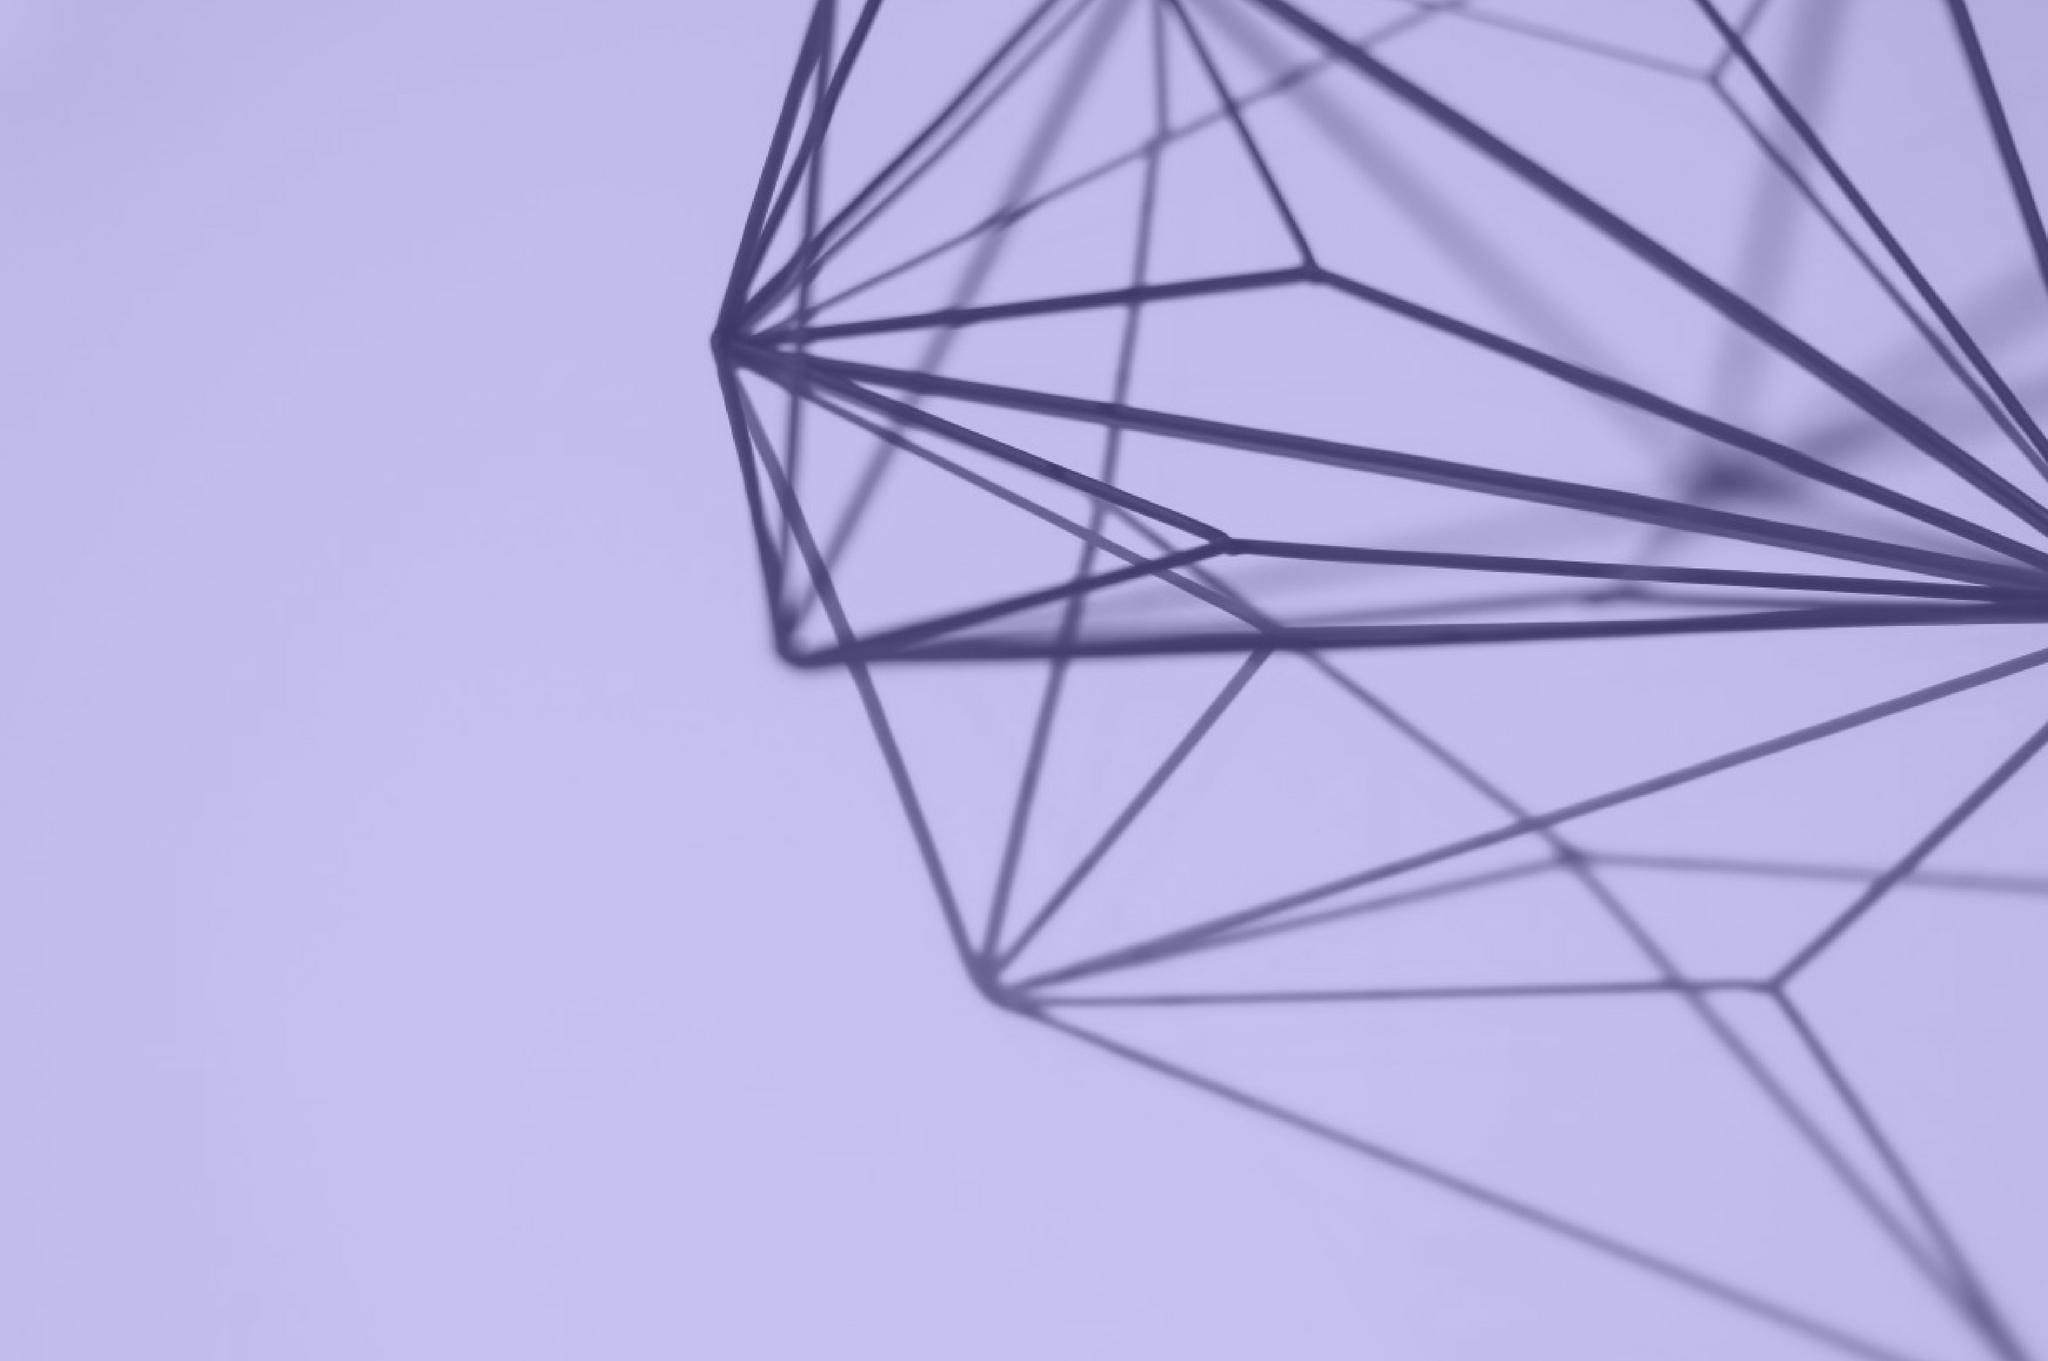 http://howmightwe.com/wp-content/uploads/2018/07/design-thinking.jpg